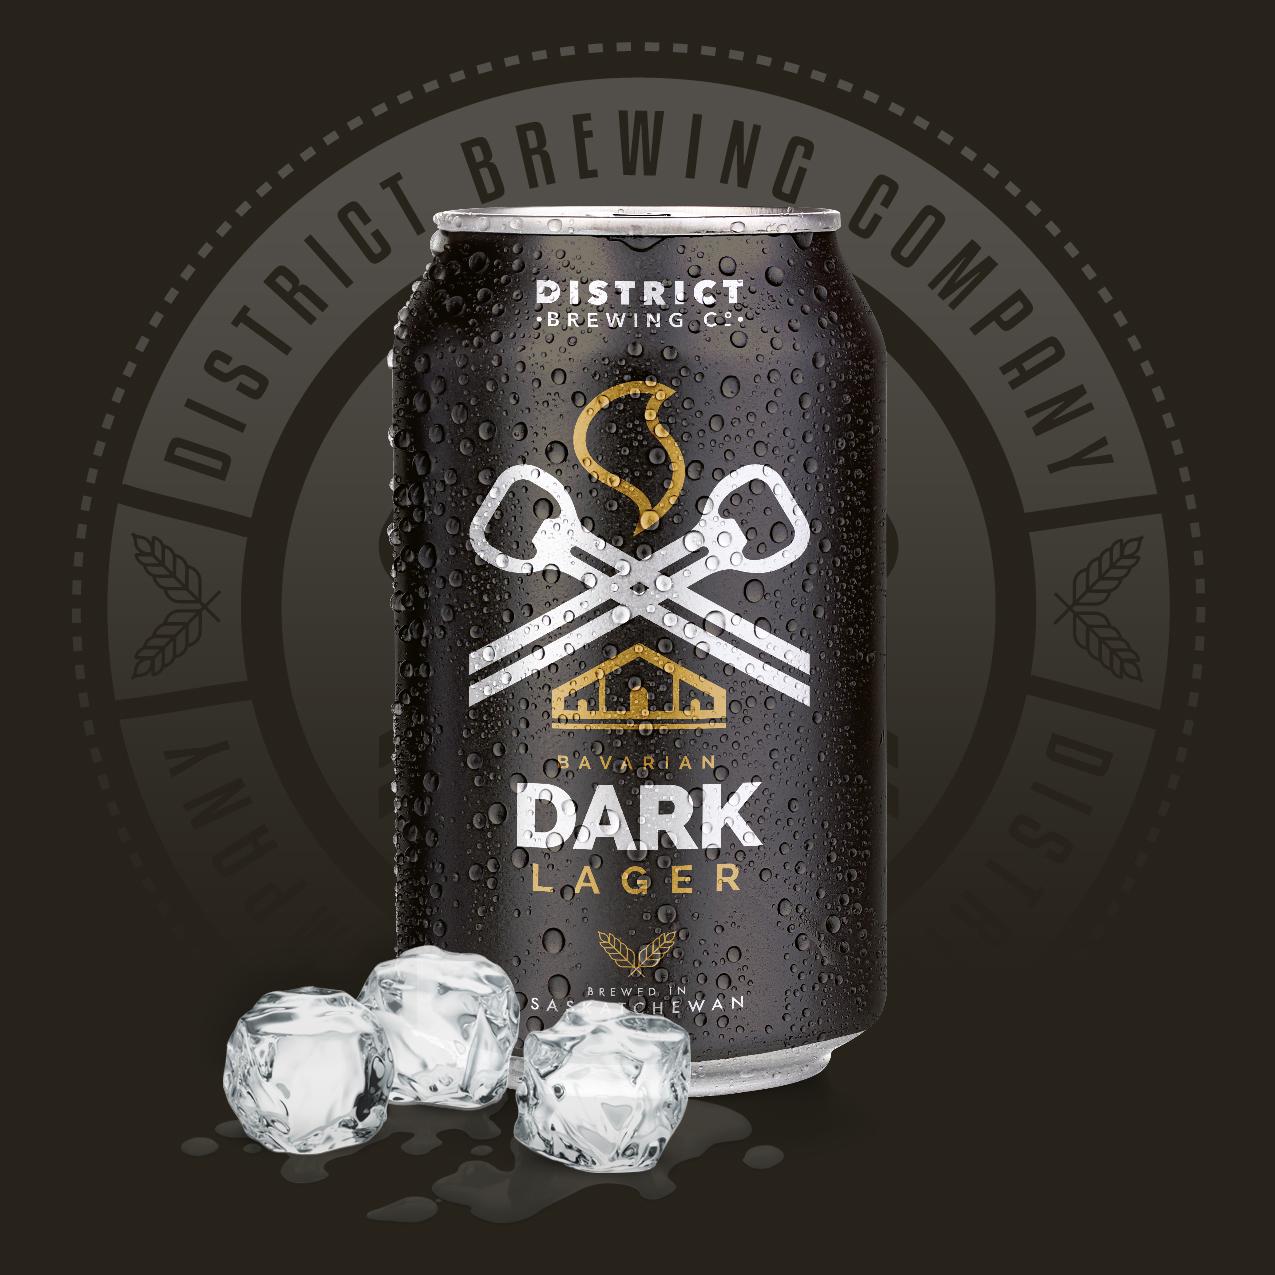 Bavarian Dark Distrcit Brewing Company Craft Beer